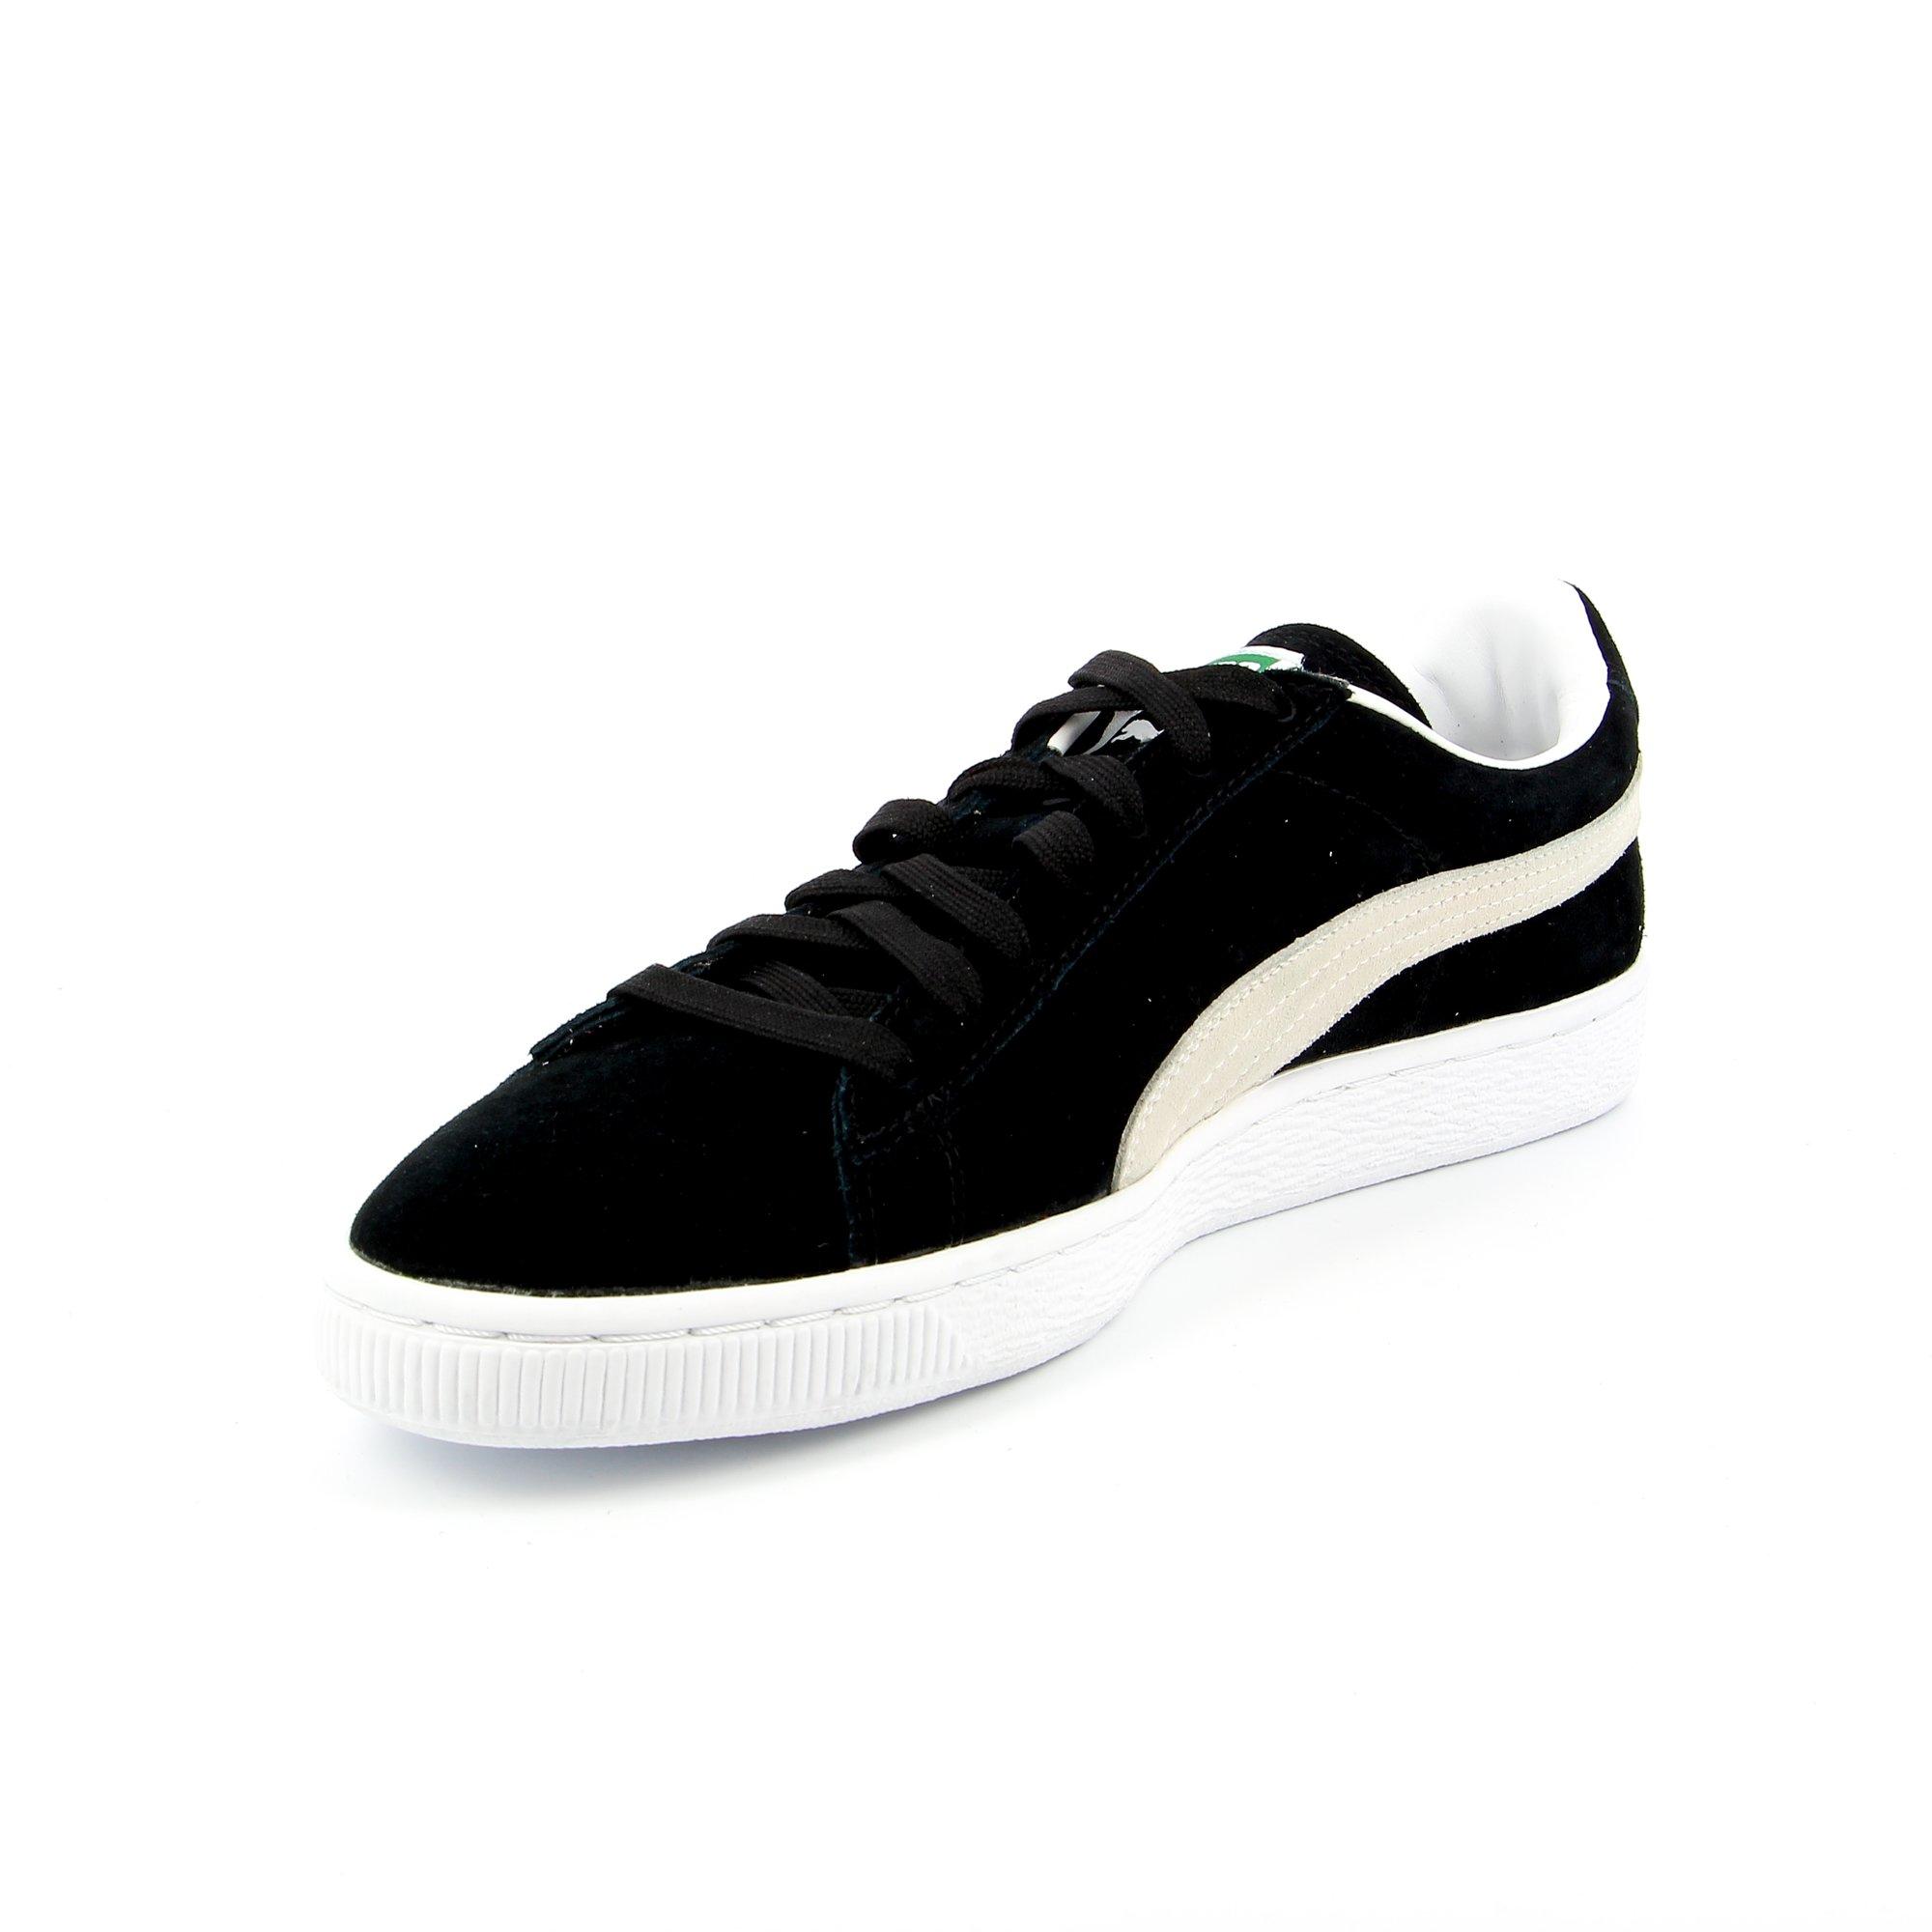 Puma Basket noir